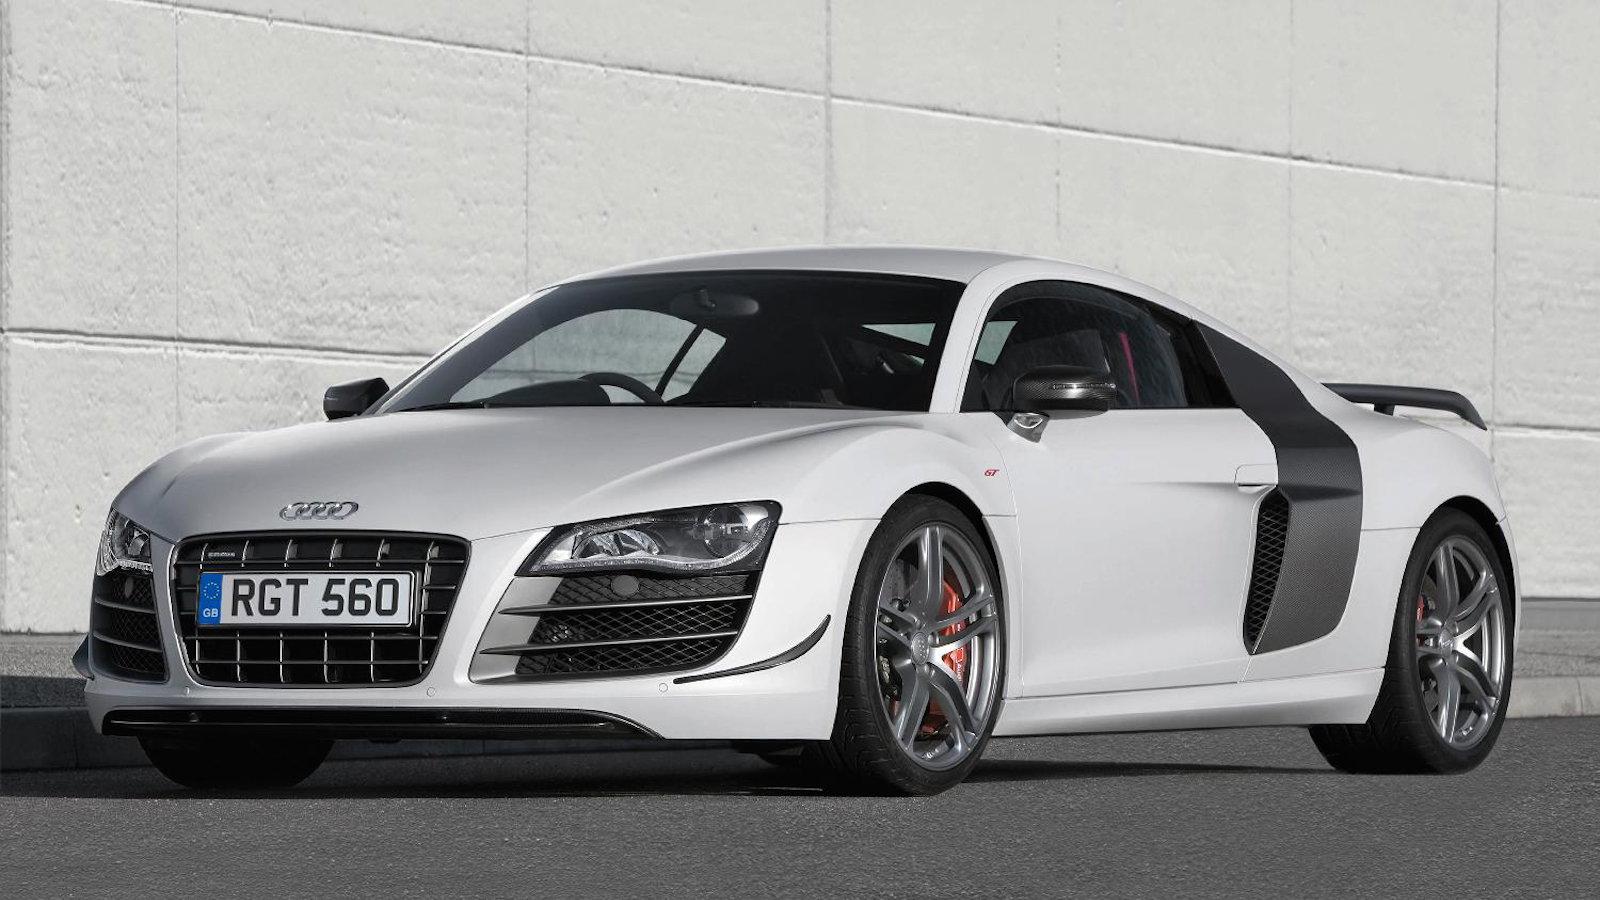 2011 Audi R8 GT V10